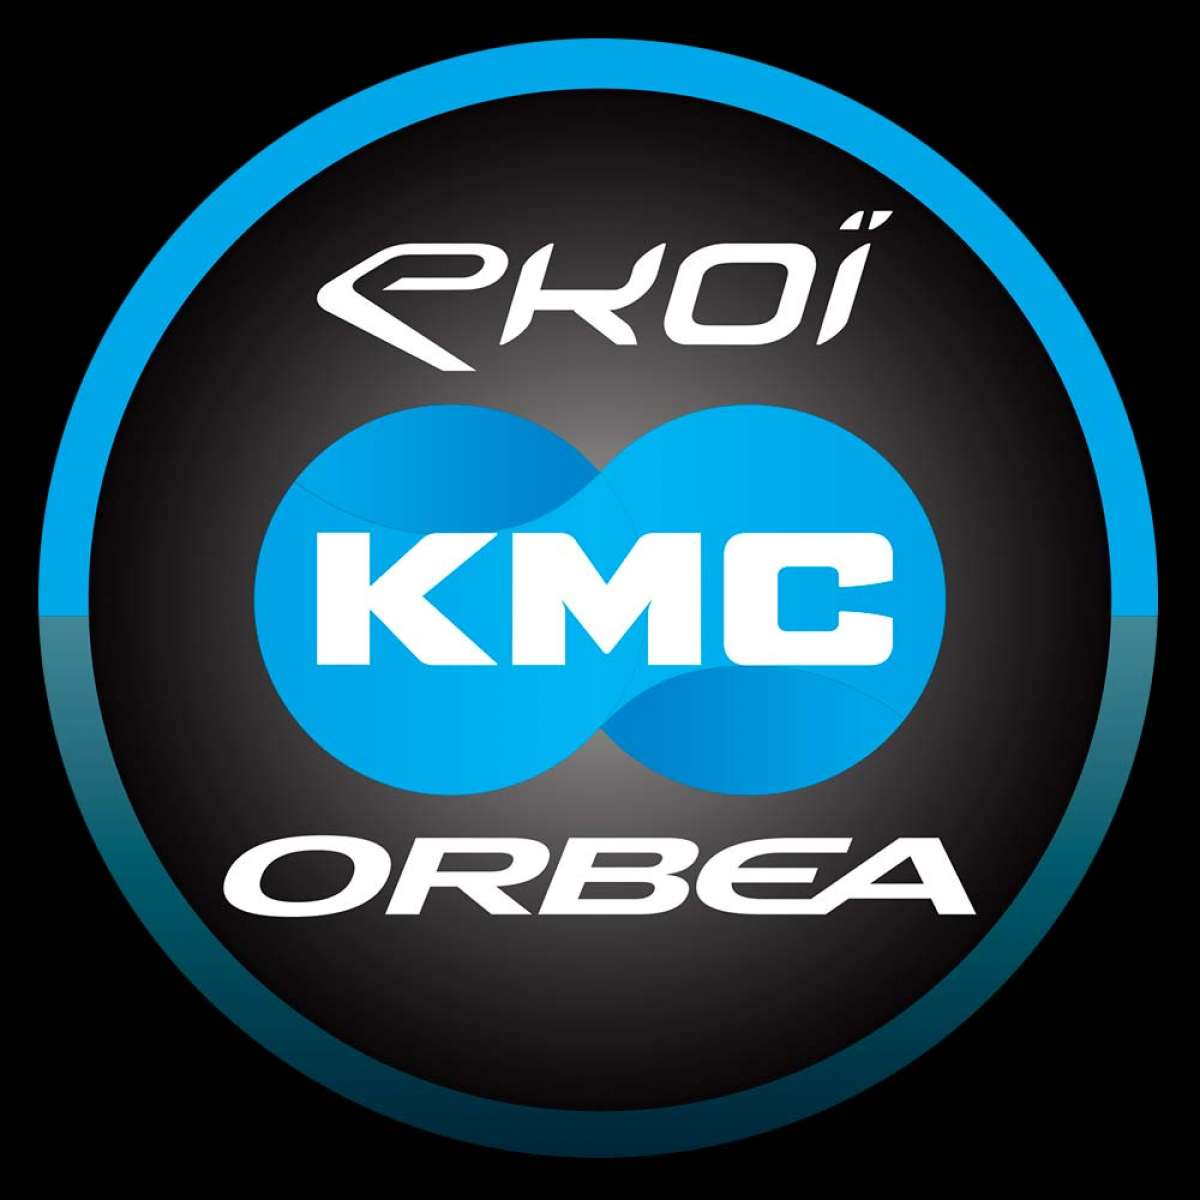 En TodoMountainBike: Orbea entra de pleno en la Copa del Mundo de XCO patrocinando al Team KMC-Ekoï-Orbea